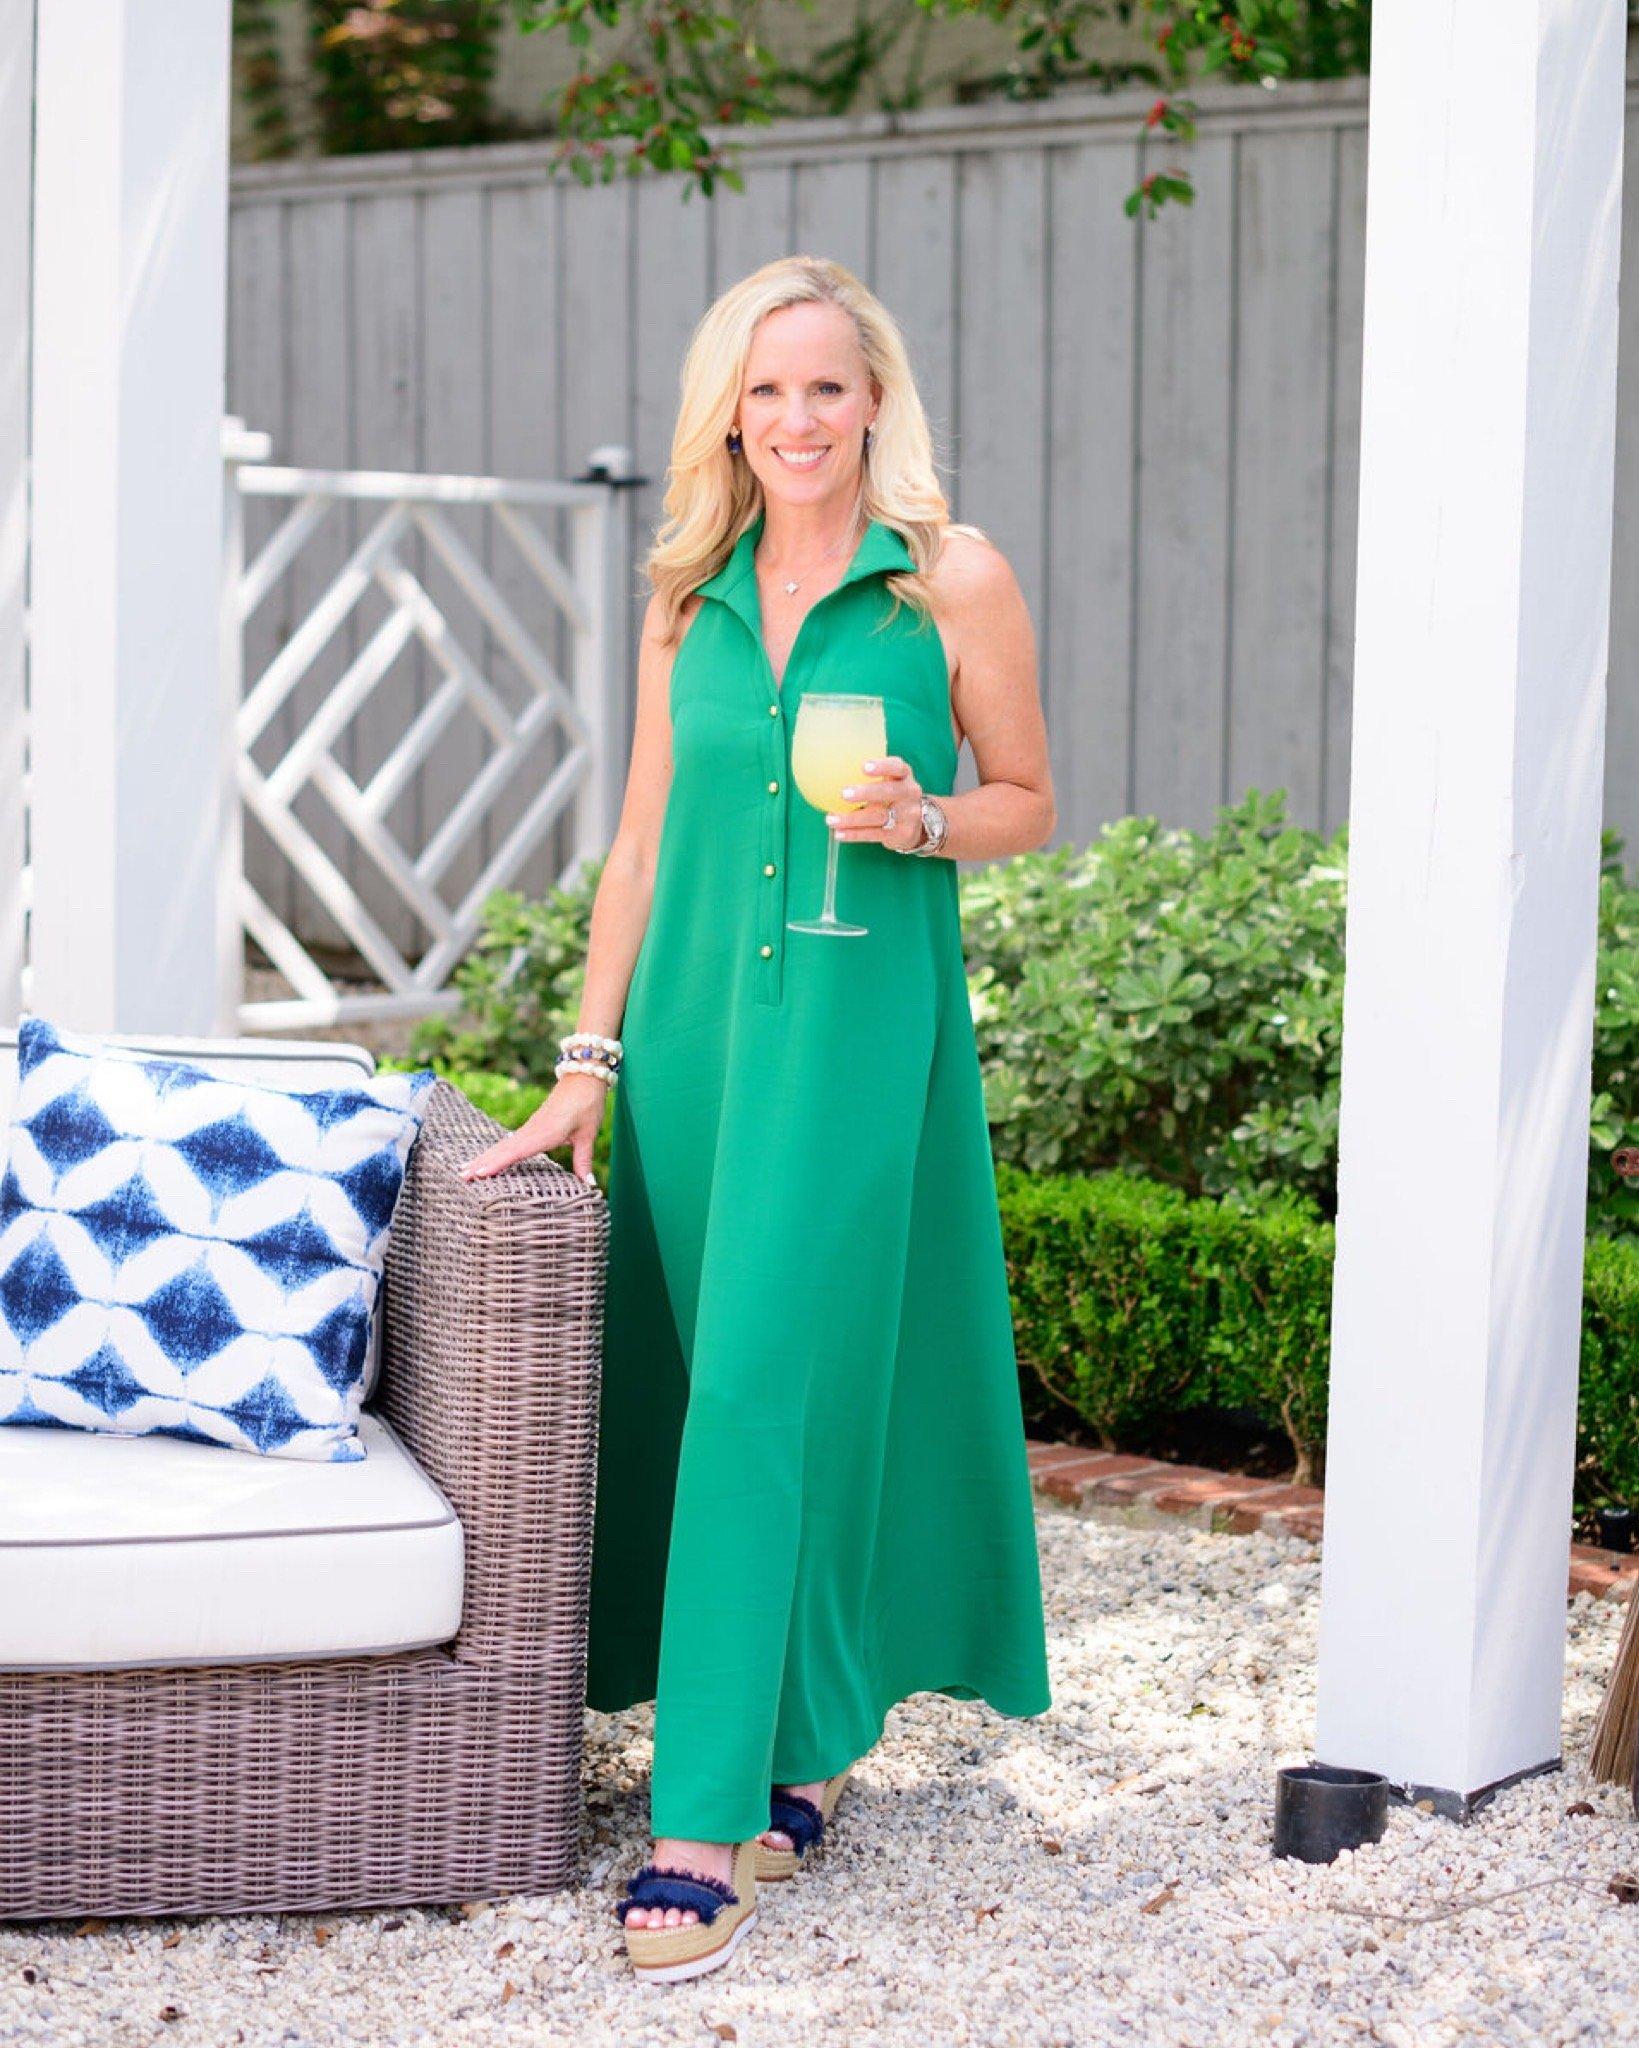 Style Focus: Summer Maxi Dresses